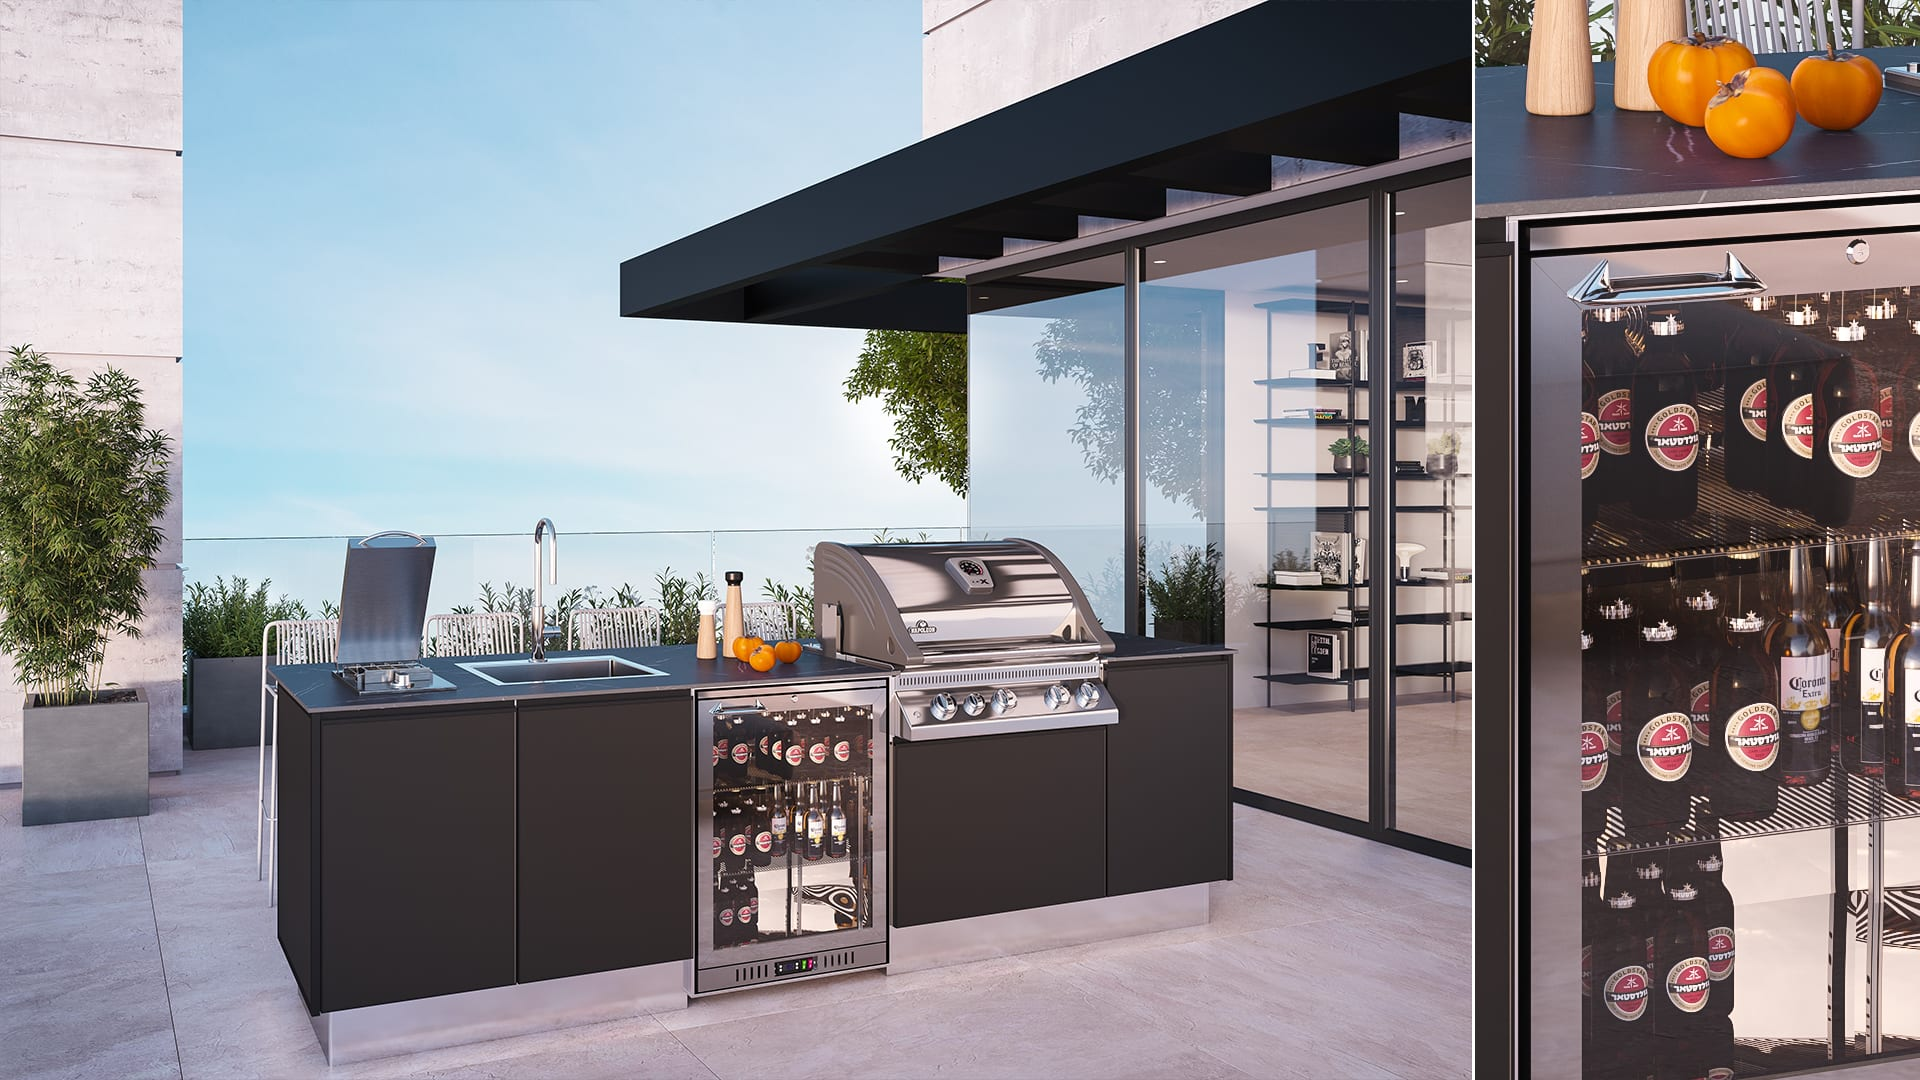 Maayan-Golan_Architectural-Visualization_product-visualization_outdoor-kitchen_alumex-by-formex_farran-kitchen_04